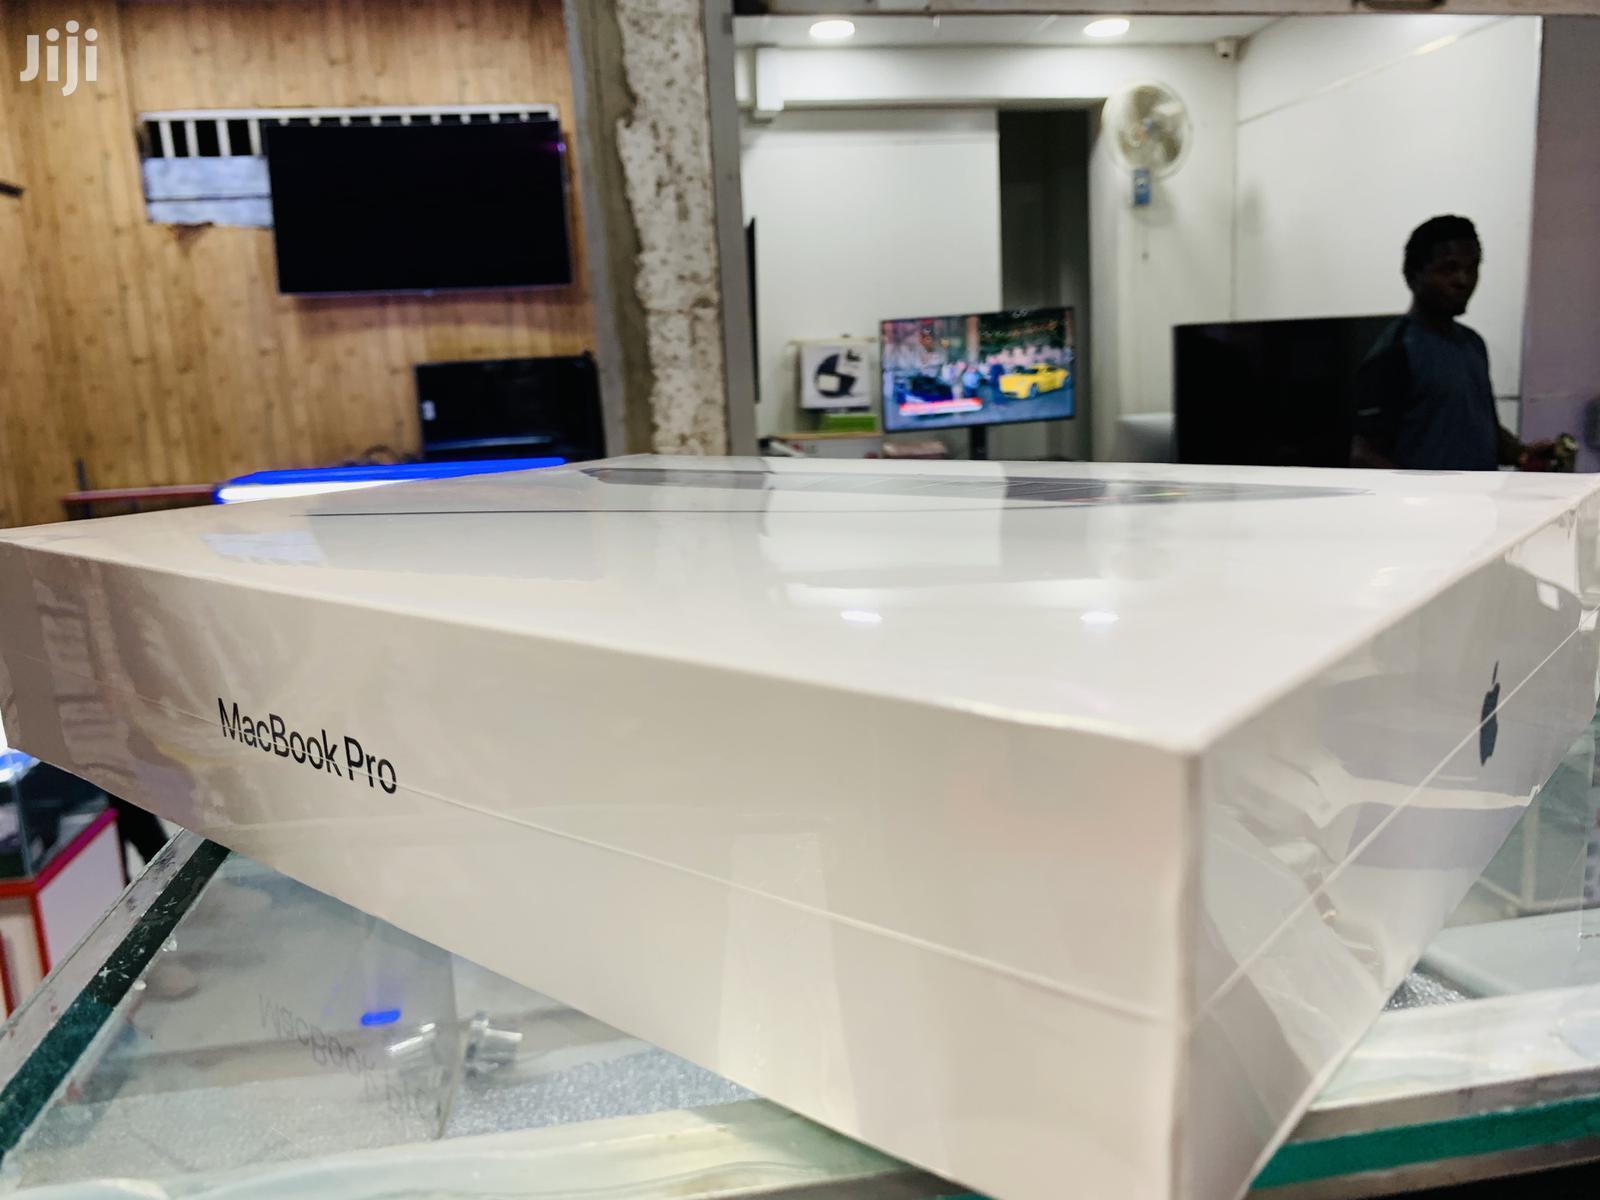 New Laptop Apple MacBook Pro 8GB Intel Core i5 SSD 256GB | Laptops & Computers for sale in Kampala, Central Region, Uganda